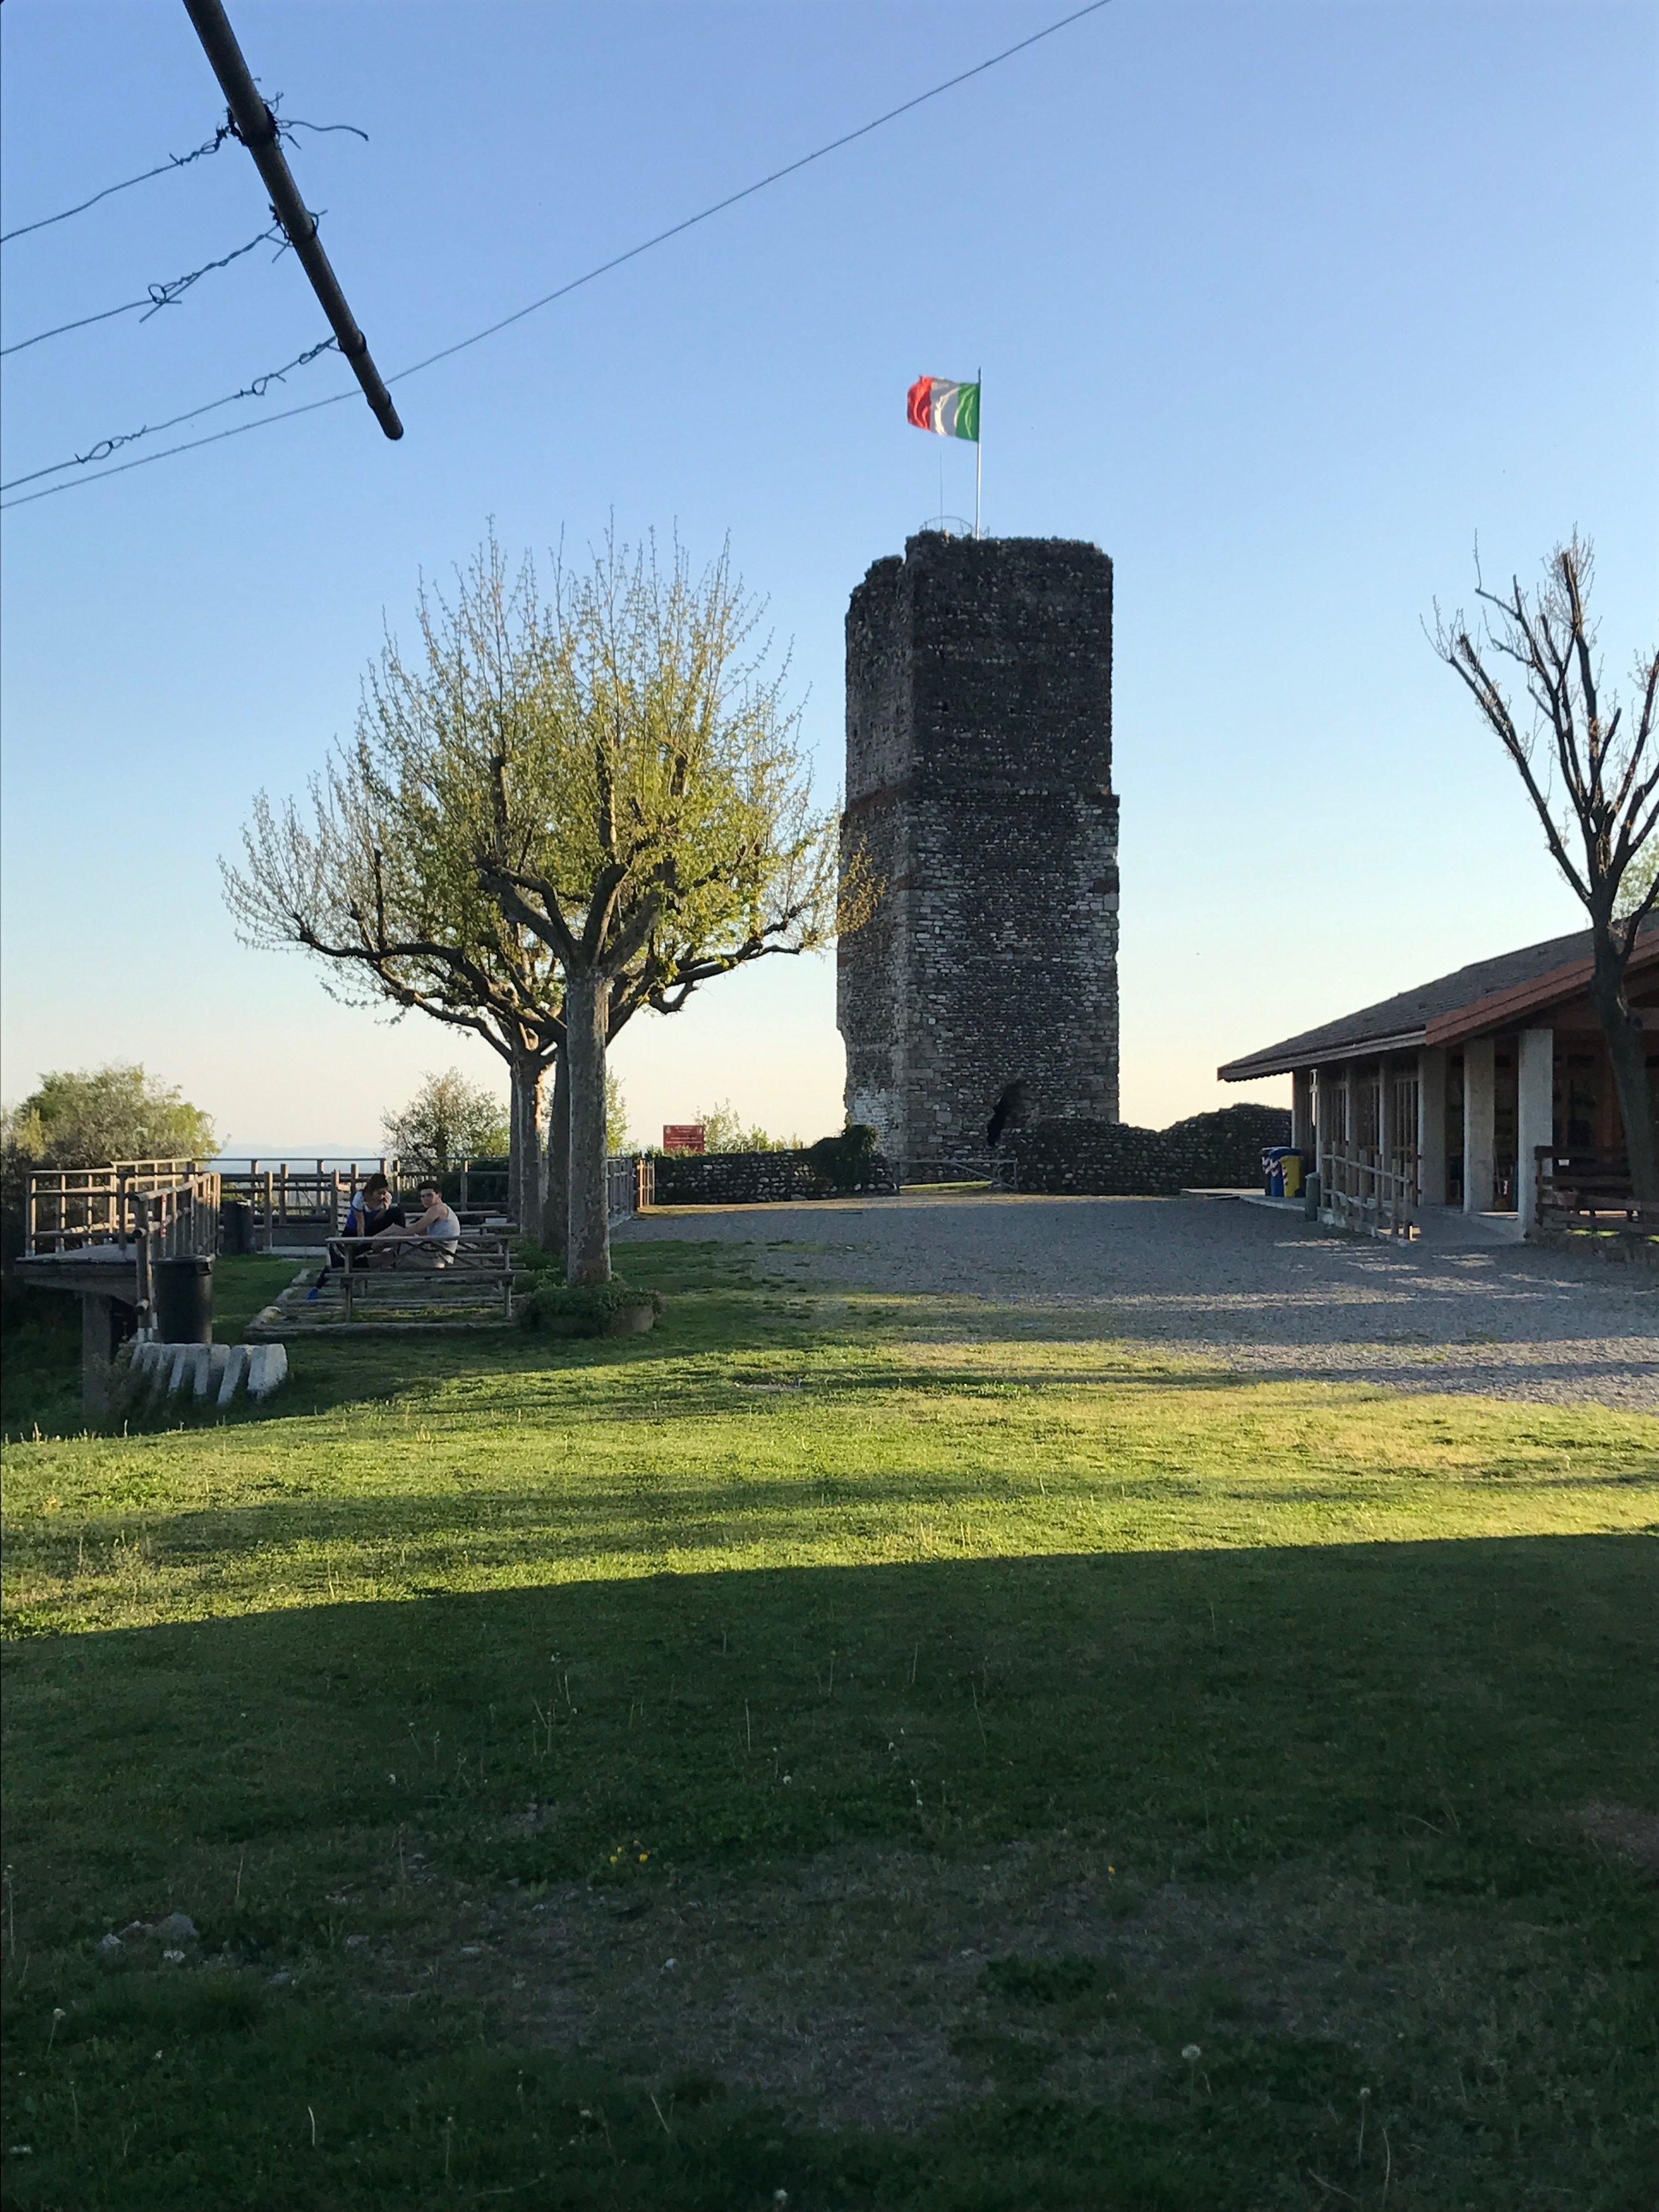 Gattinara - park at the tower.jpg